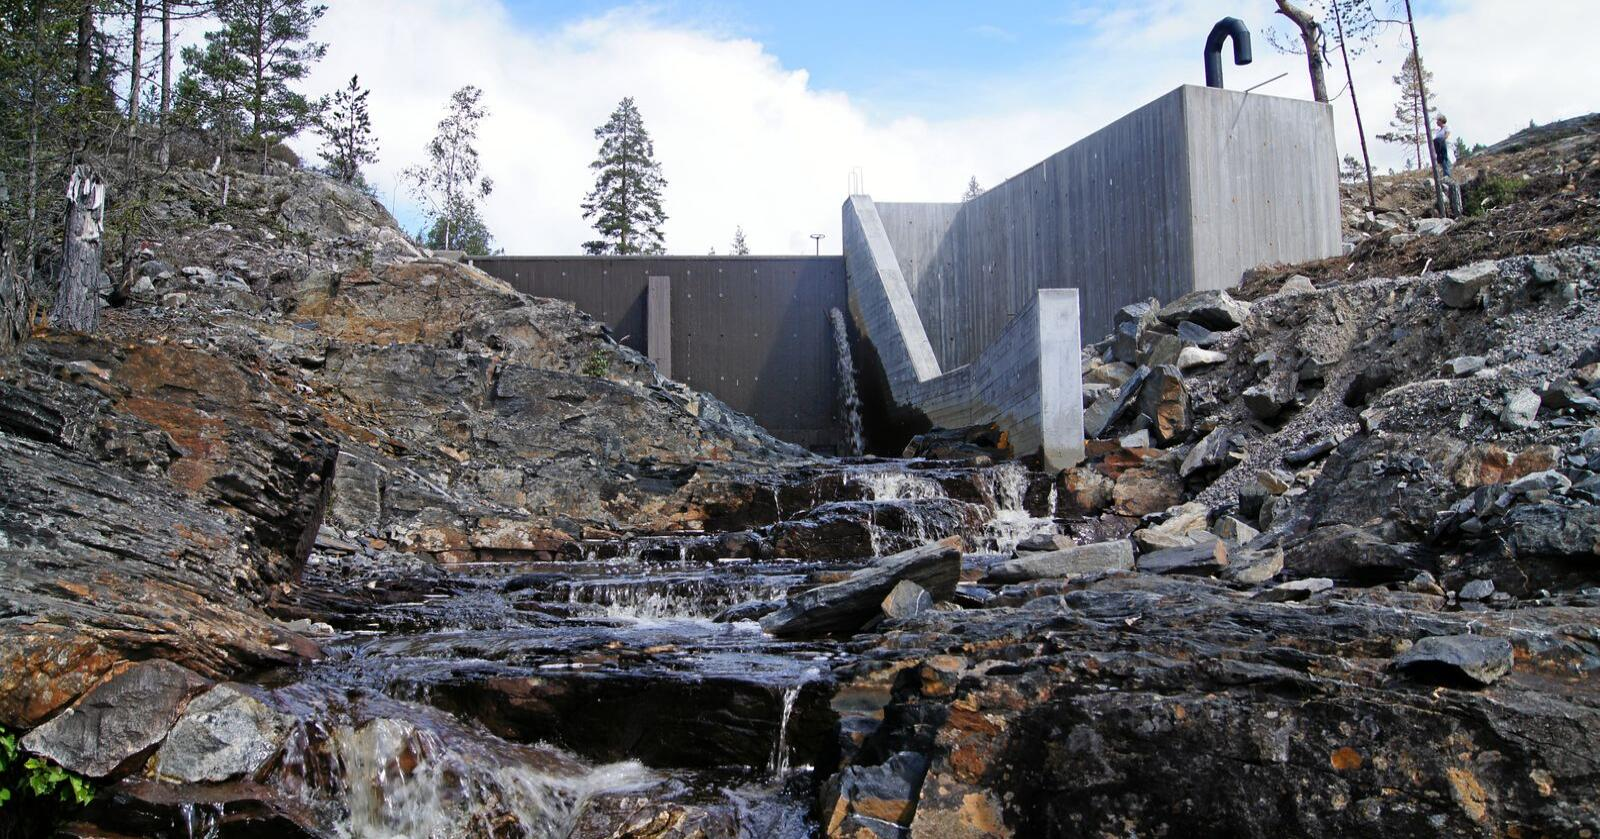 Småkraftverk ved Momrak i Fyresdal. Foto: Erik Vestgård